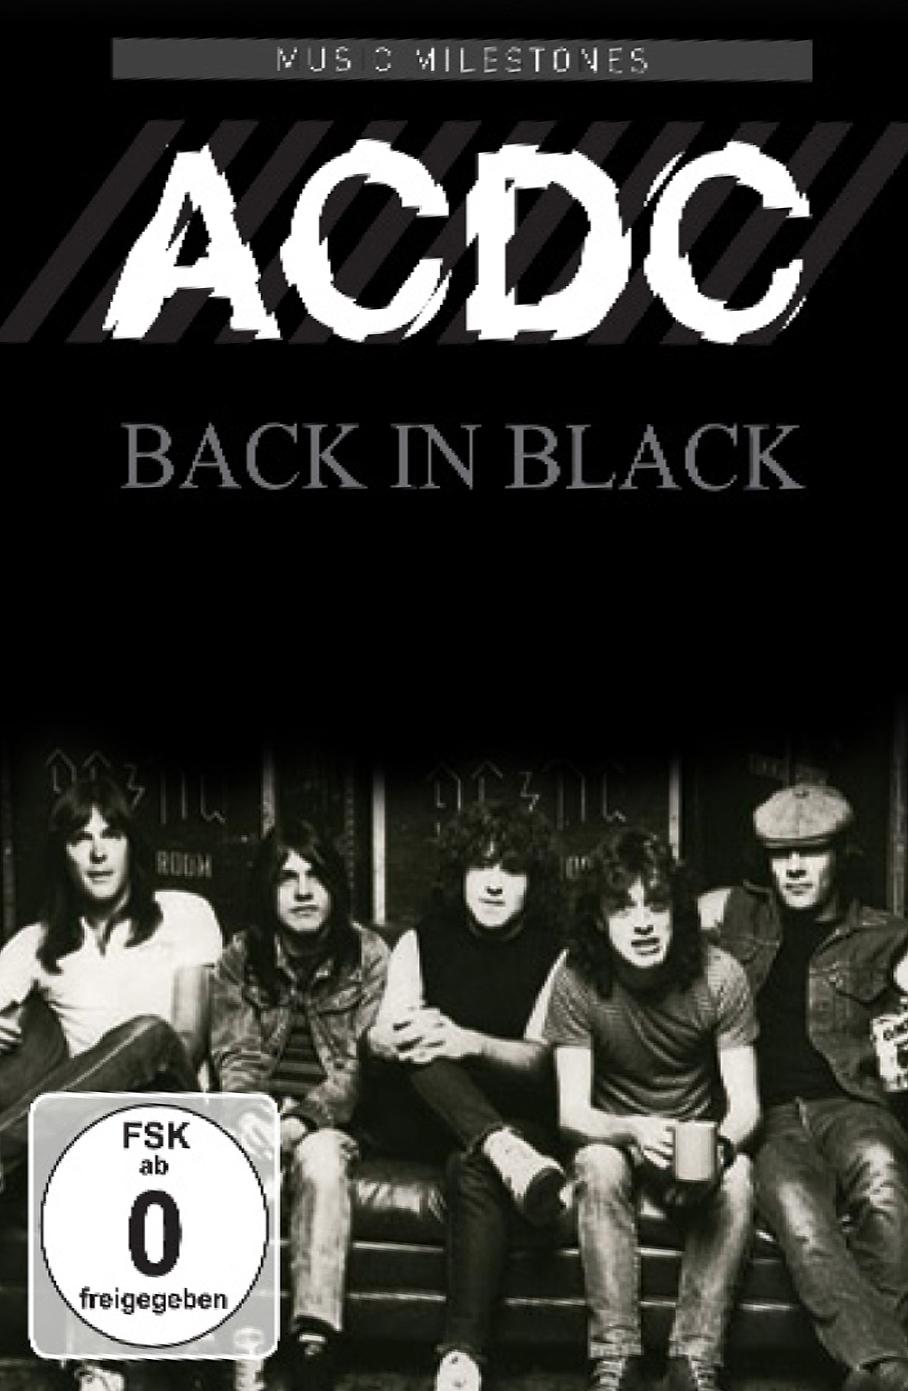 AC/DC: Music Milestones - Back in Black